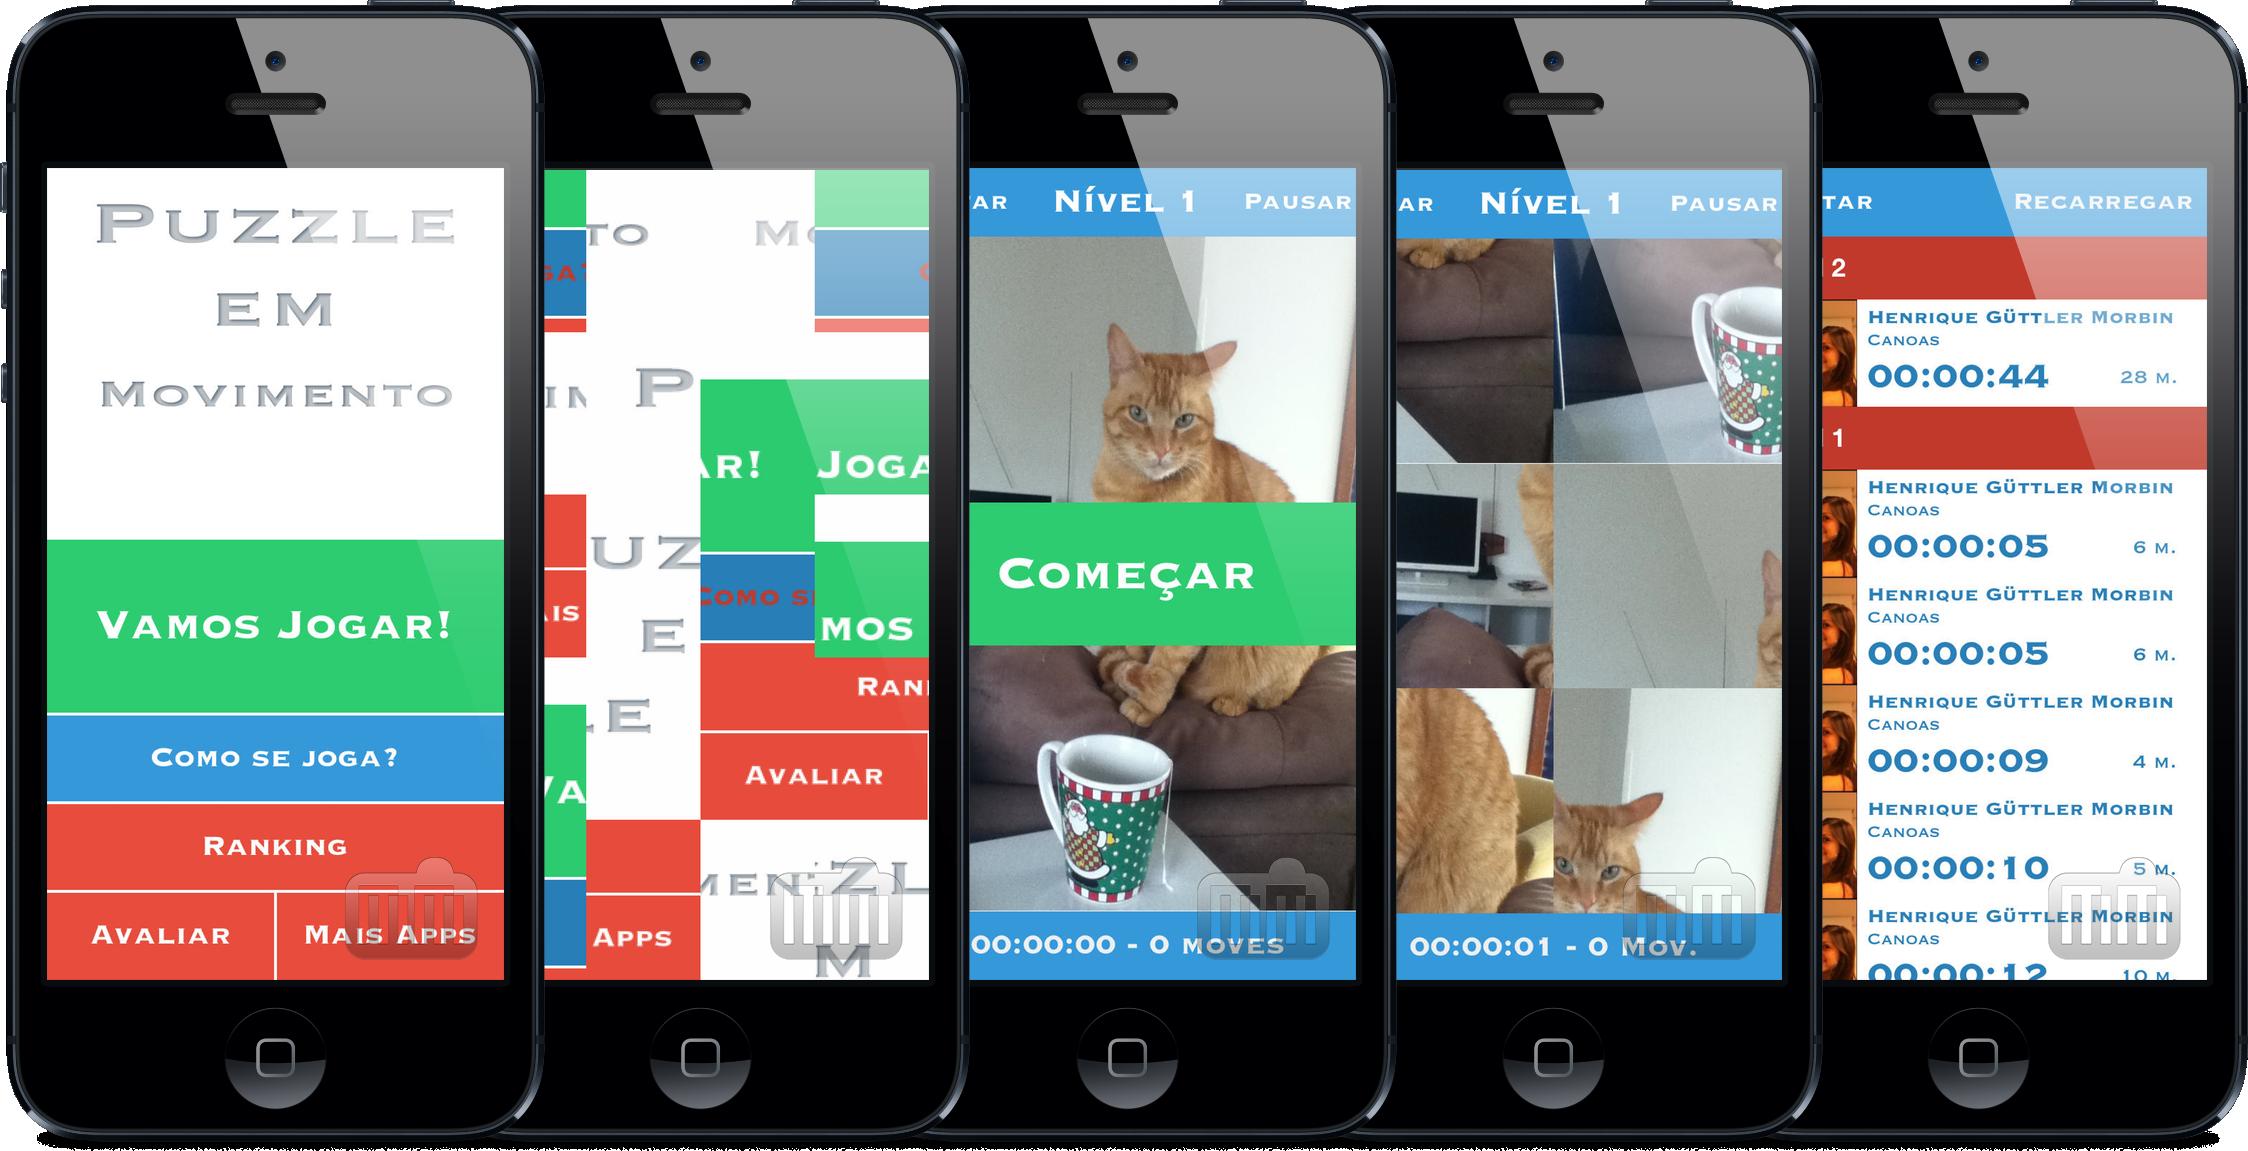 Jogo Puzzle em Movimento para iPhones/iPods touch